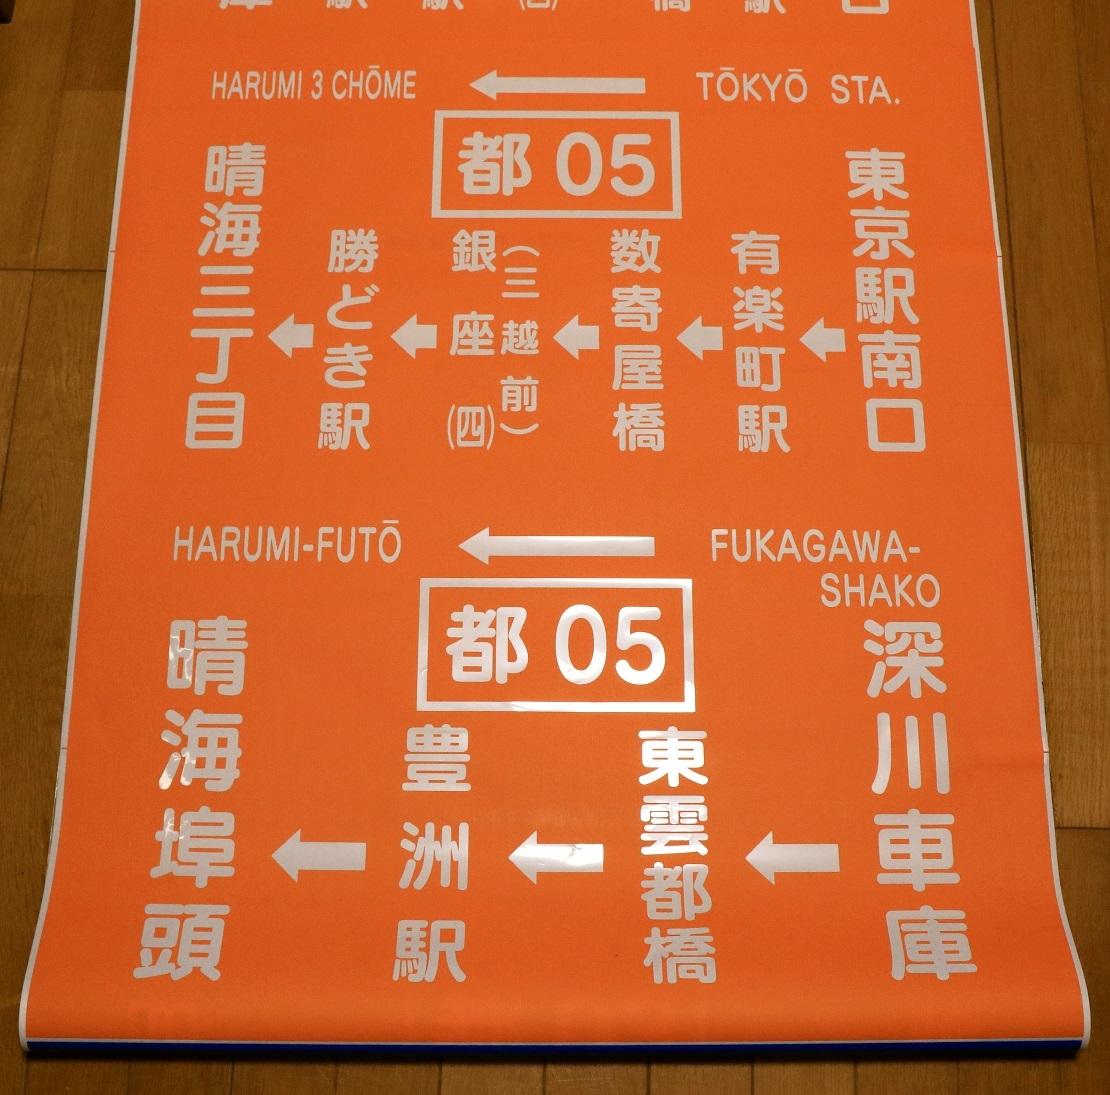 【都営バス】深川営業所・側面方向幕/98コマ収録/H2.4~使用_画像4